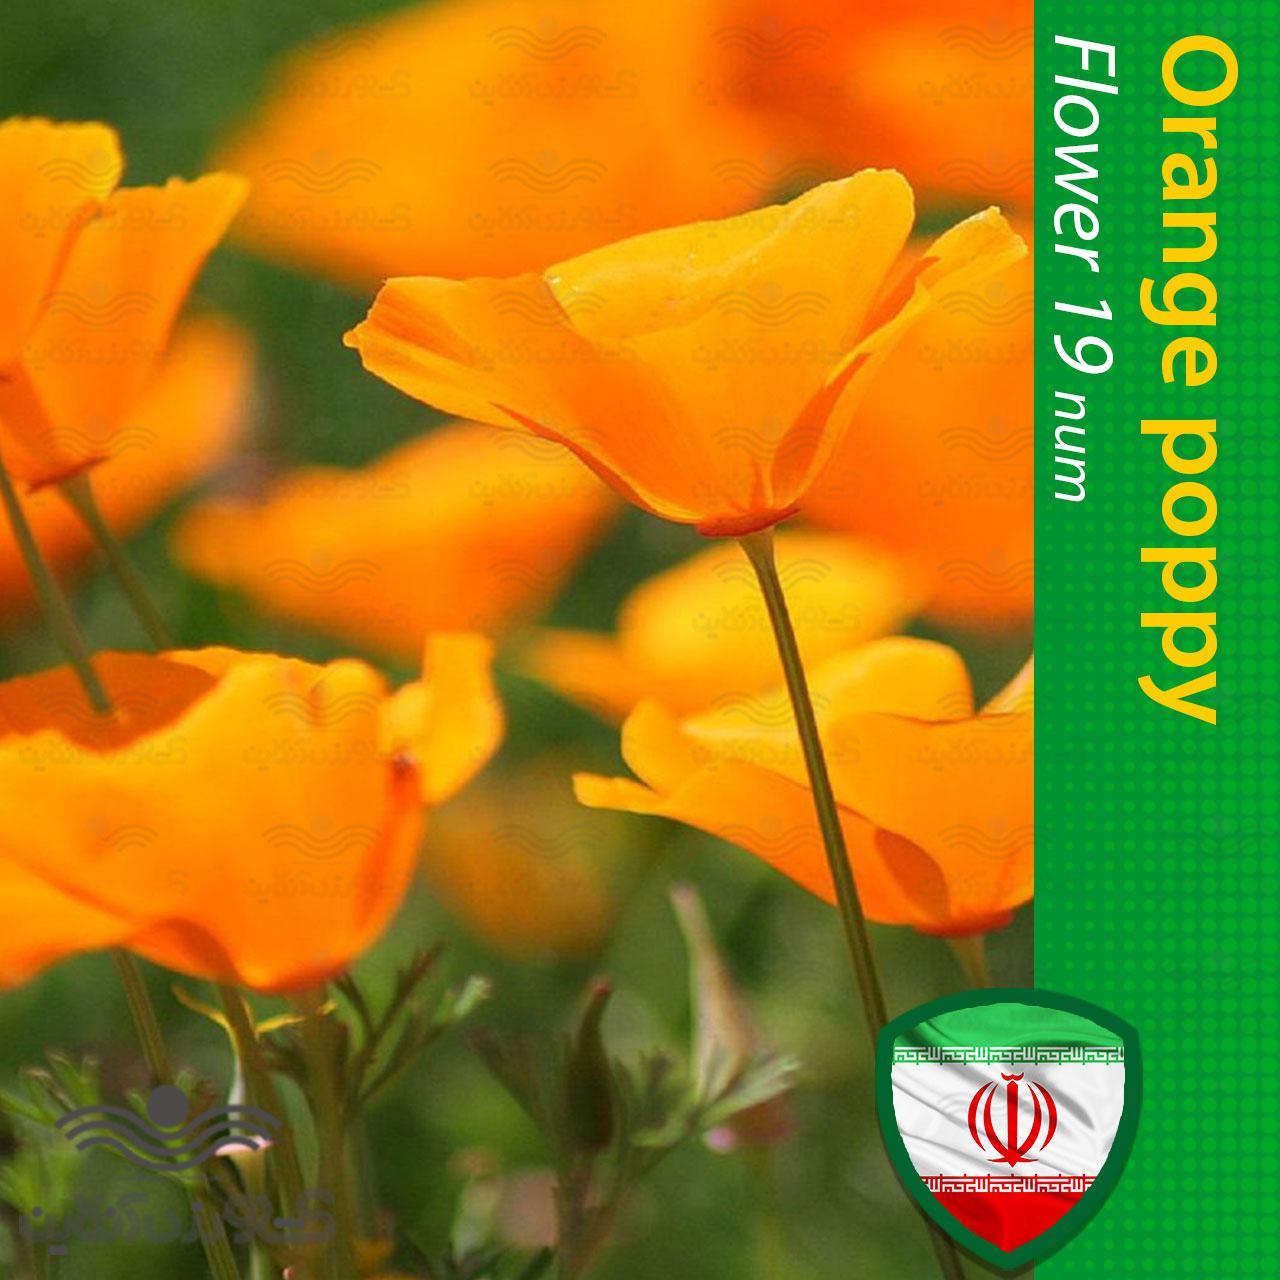 بذر گل شقایق کالیفرنیایی پا کوتاه نارنجی